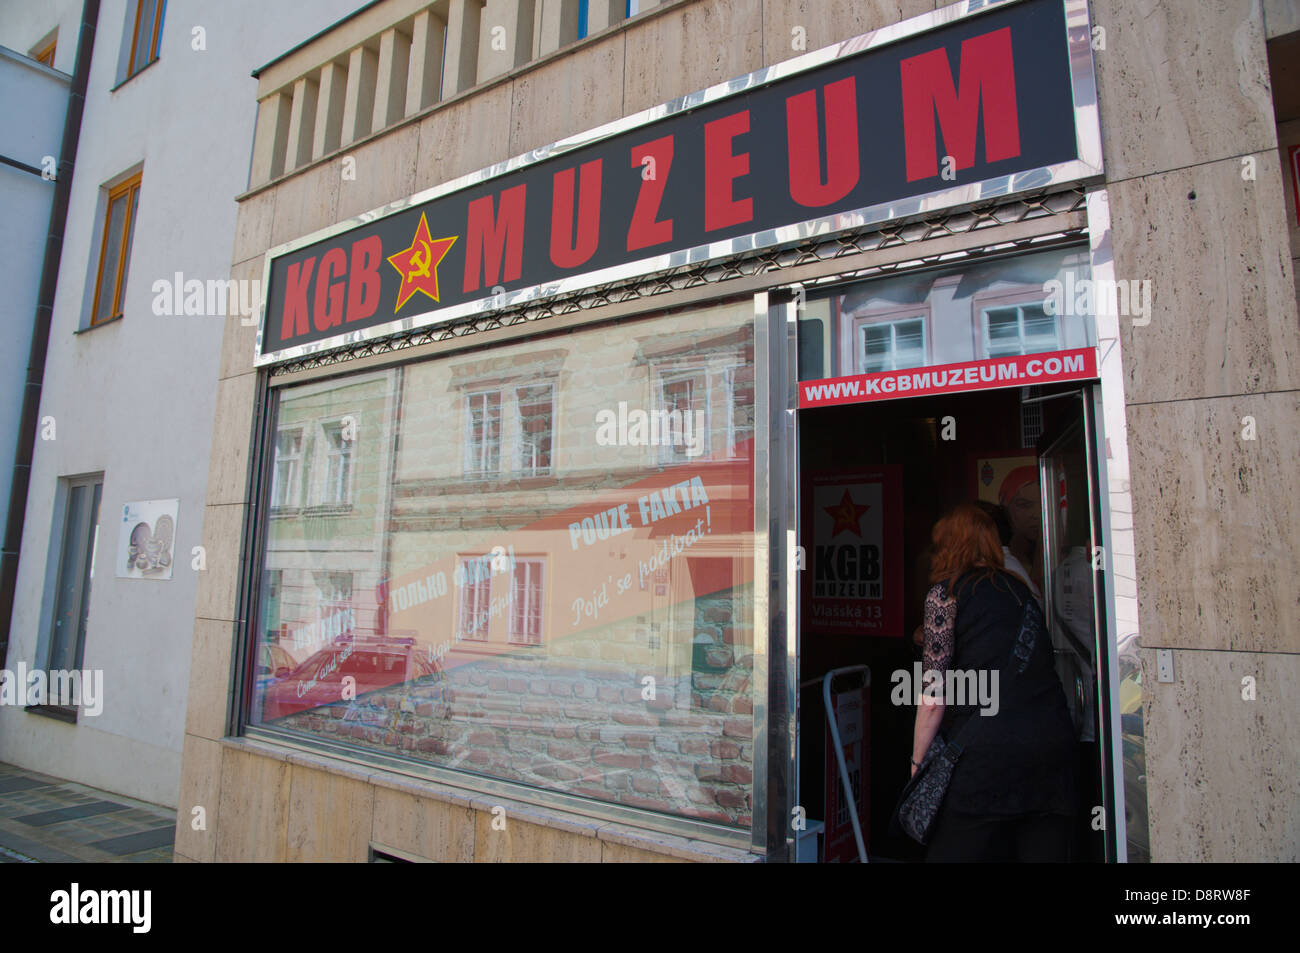 KGB Muzeum the KGB Museum Mala Strana district Prague city Czech Republic Europe - Stock Image